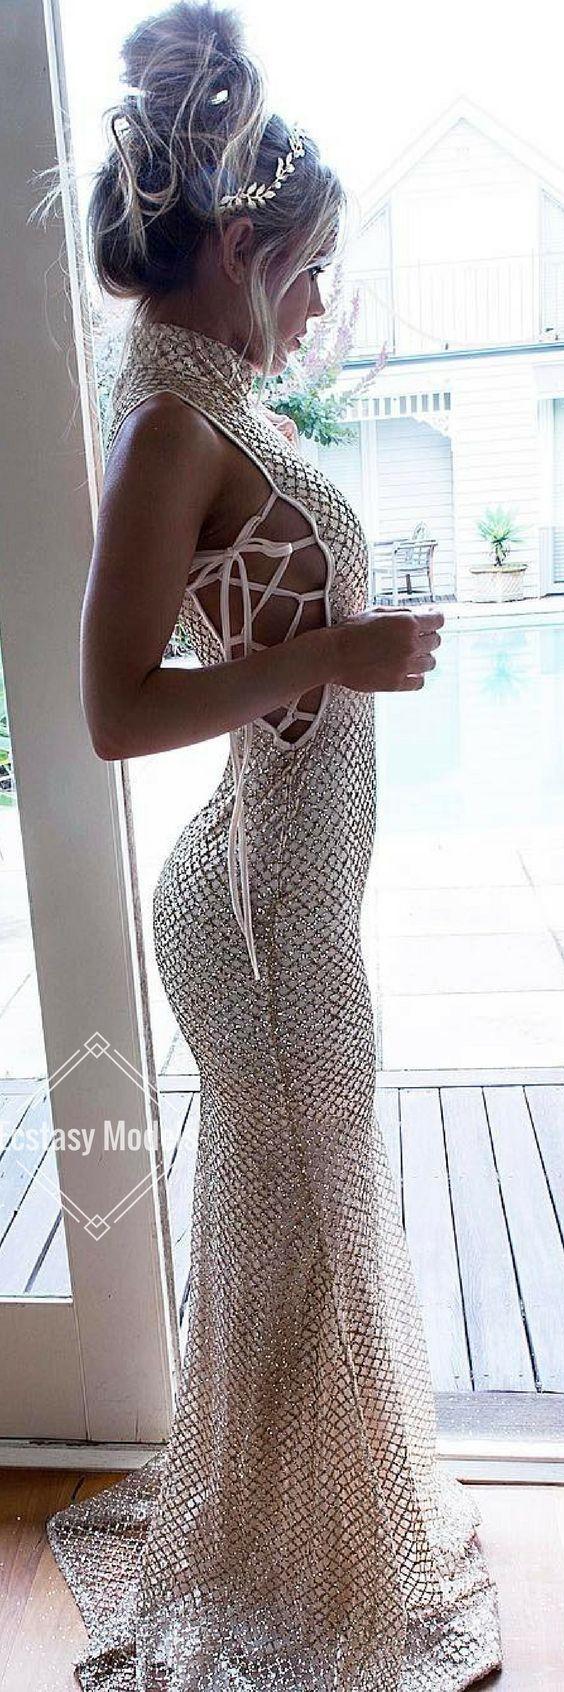 Aphrodisiaquementvotre so cute pinterest amazing dresses